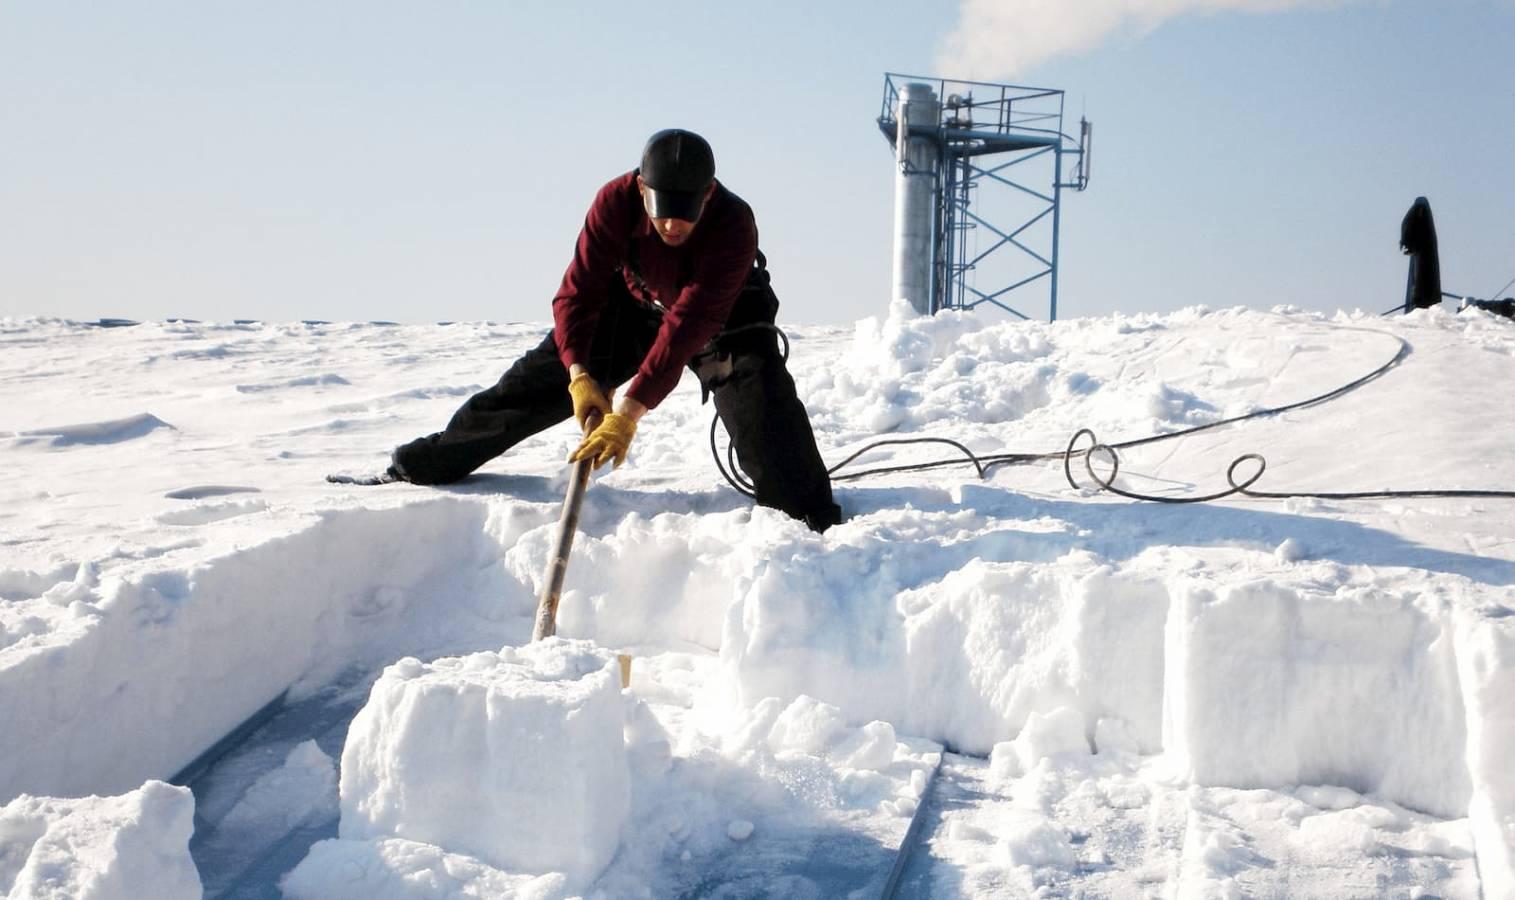 Jak usunąć śnieg z dachu domu?